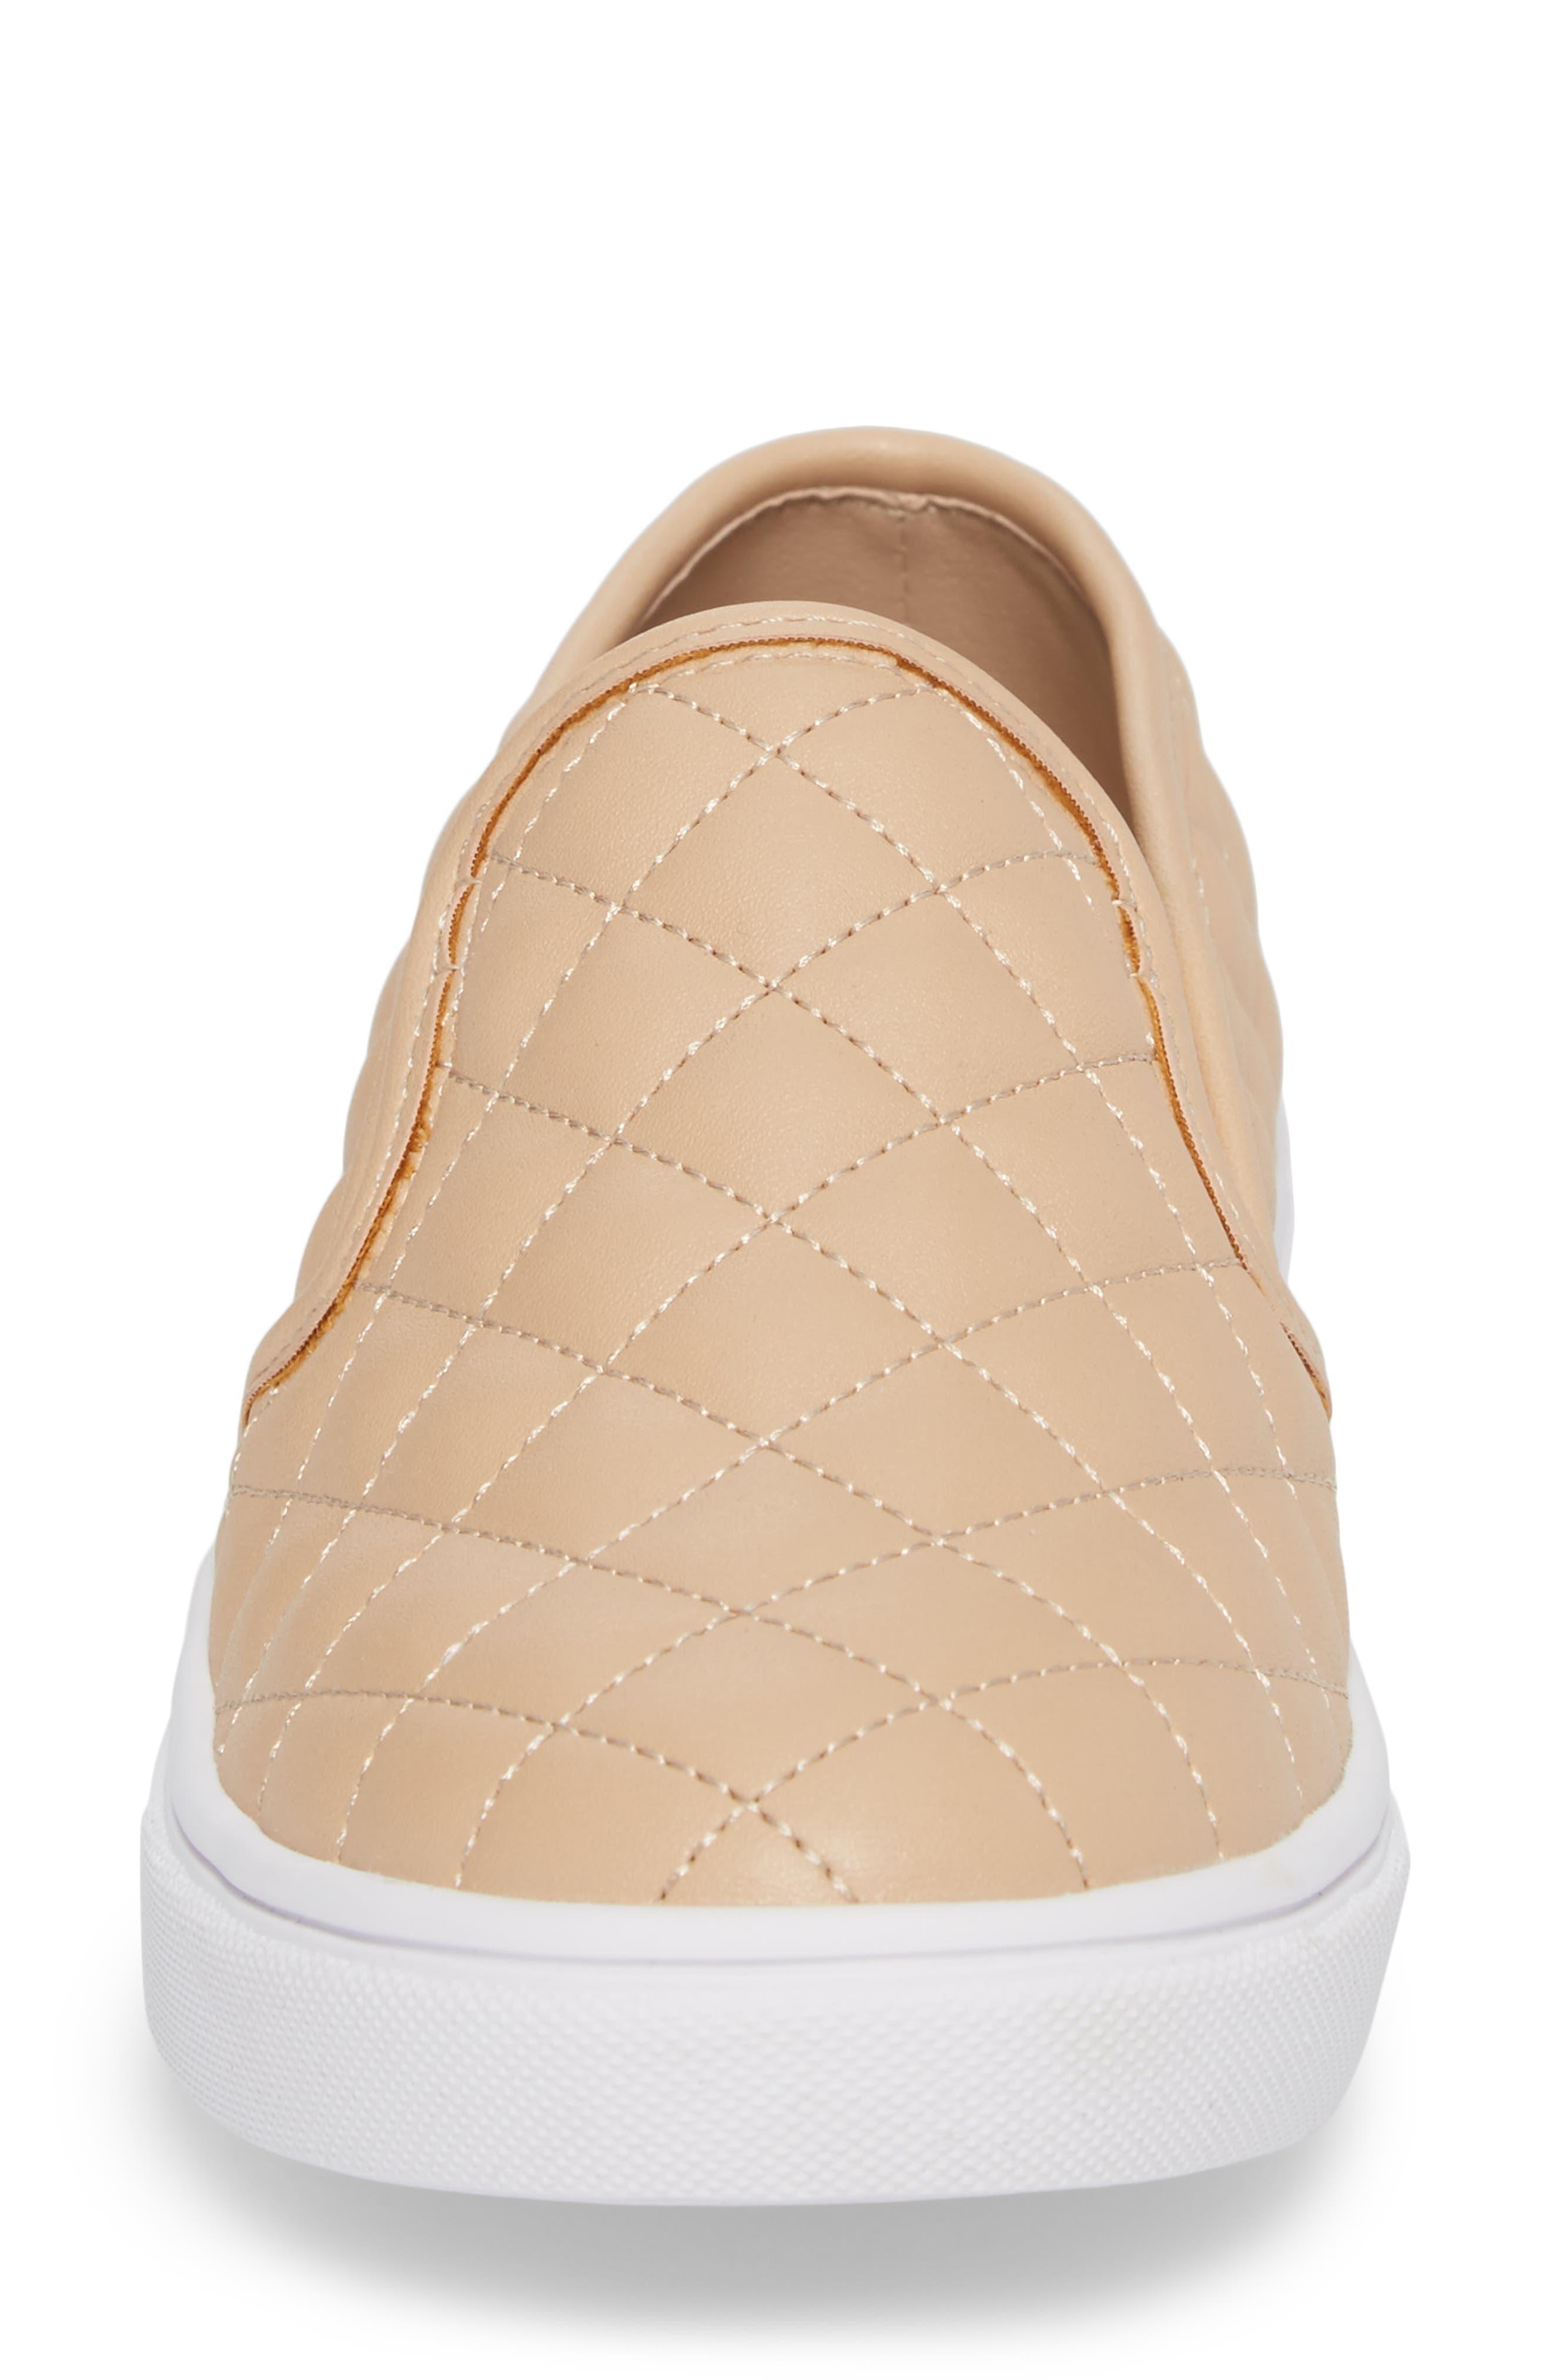 Ecentrcq Sneaker,                             Alternate thumbnail 4, color,                             250